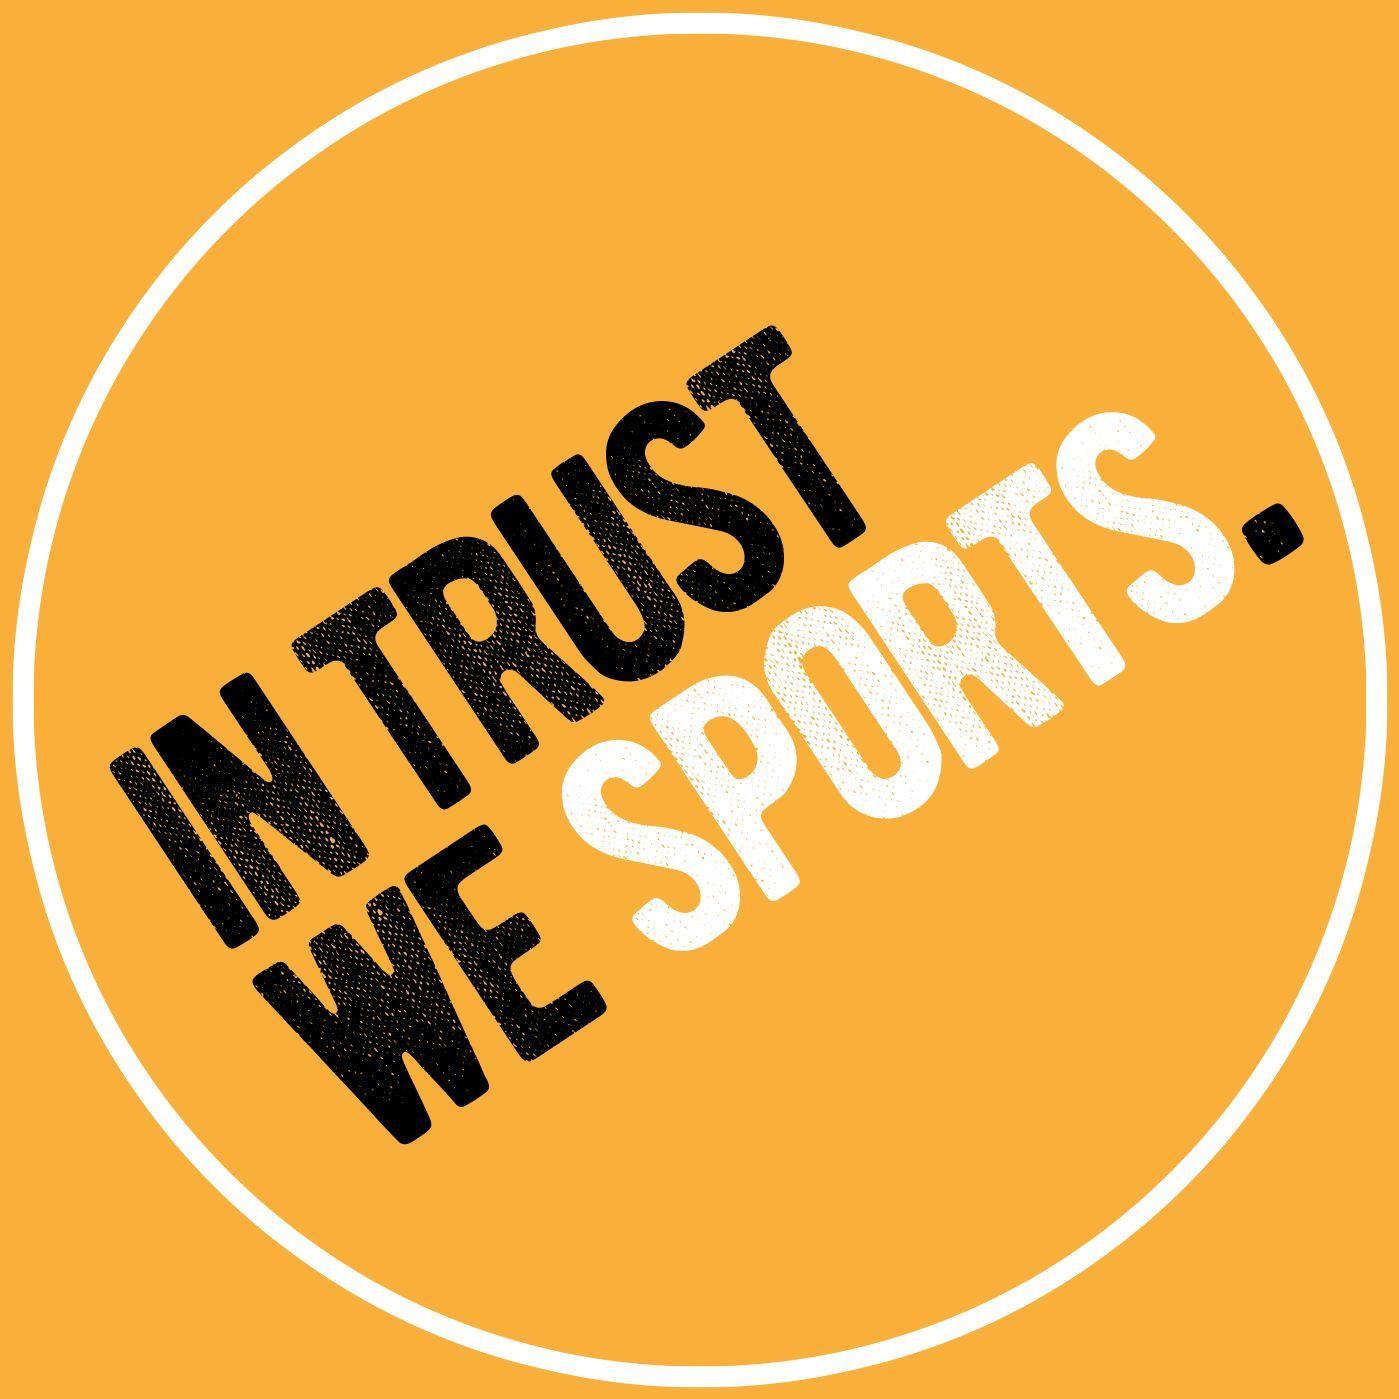 In Trust We Sports - Episode 8